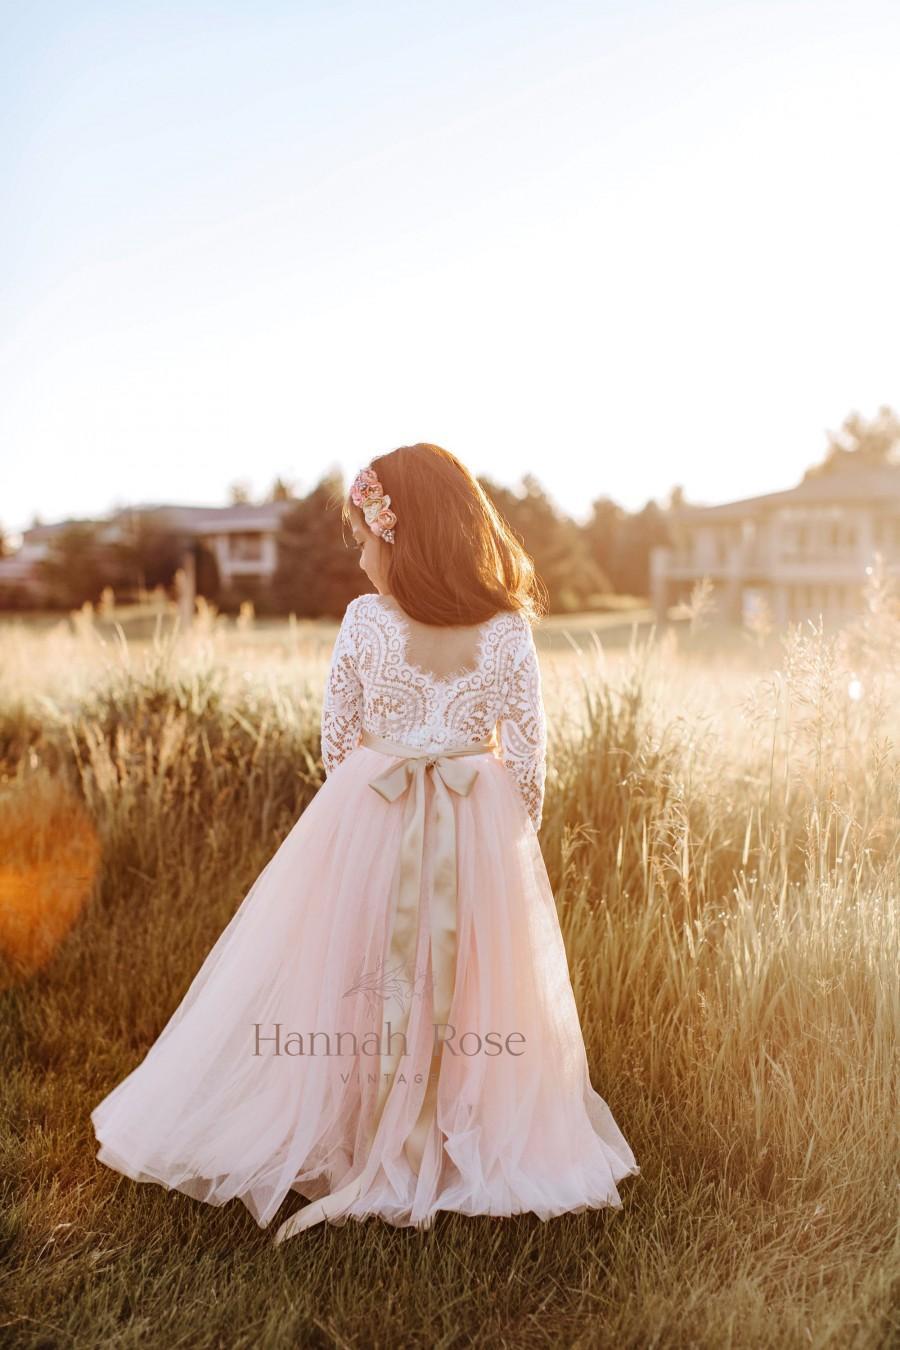 Wedding - Beautiful Blush Flower Girl Dress, Long Flowing, Boho Vintage Flower Girl Dresses, Girls Dresses, Tulle and Lace Flower Girl Dress